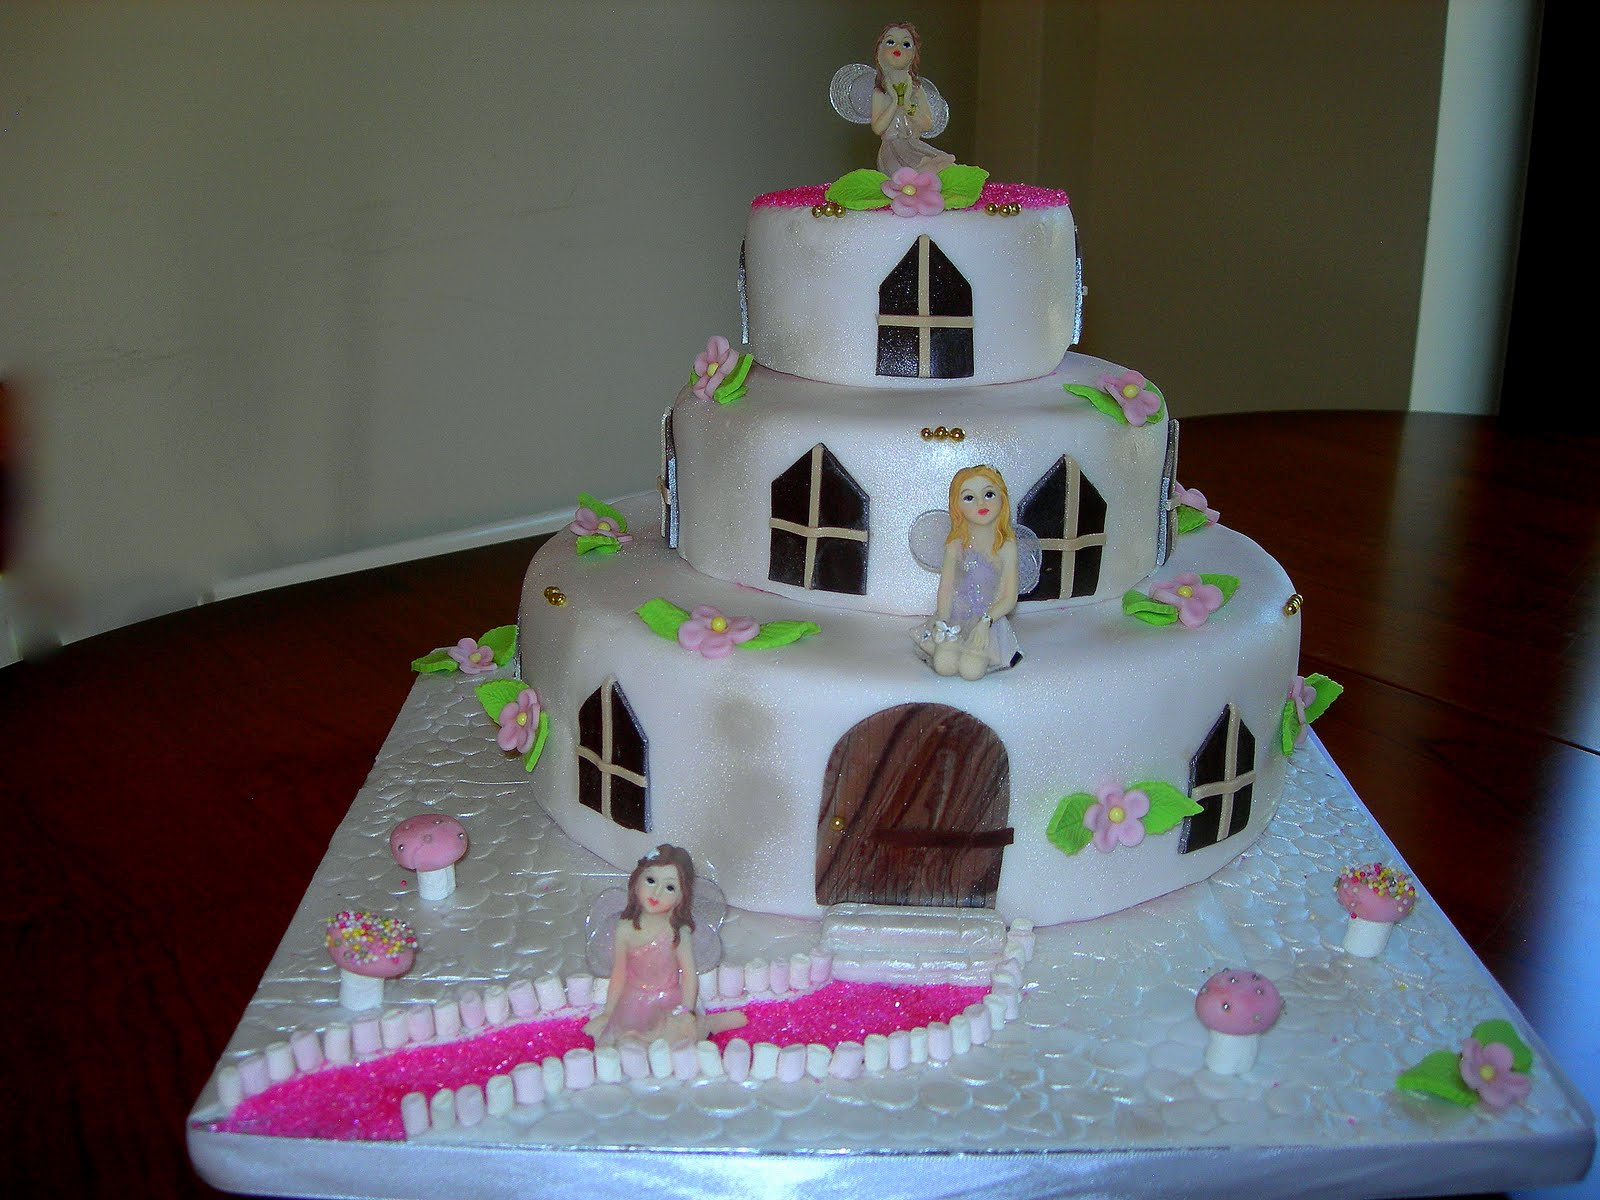 Custom Cake Design: The Fairy House